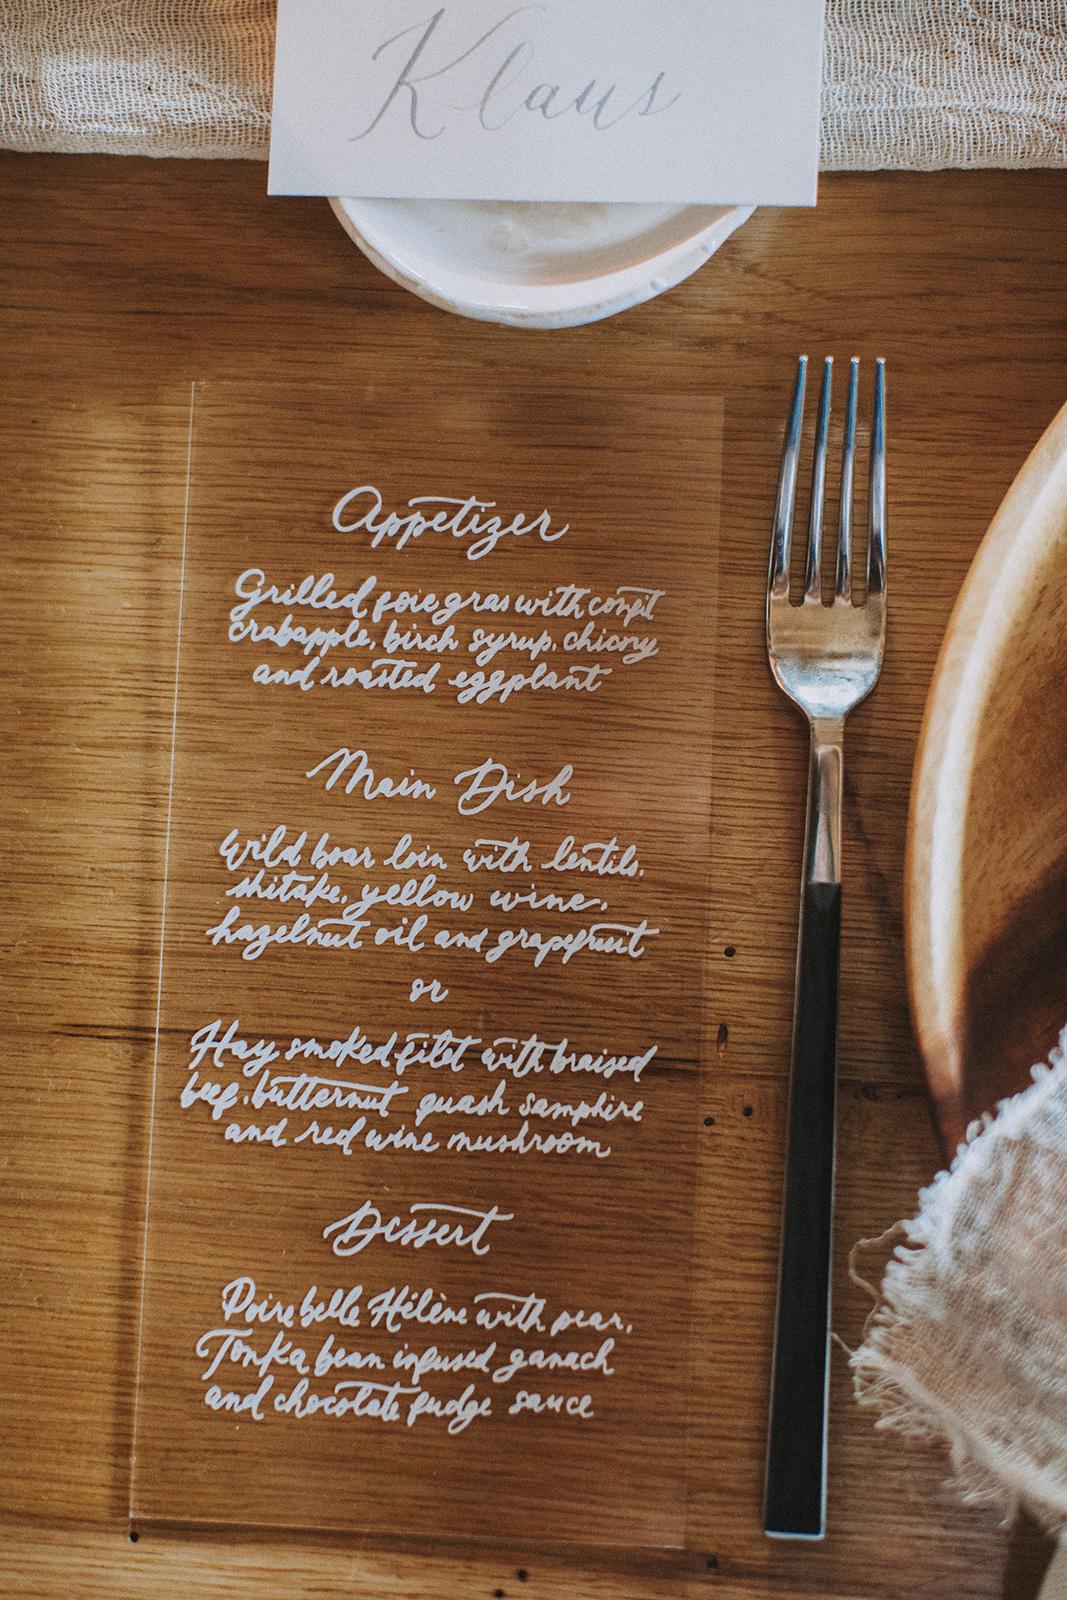 Hochzeitskarten Acryl, Hochzeitstrend 2018 Acryl, Acryl Menükarte Kalligrafie